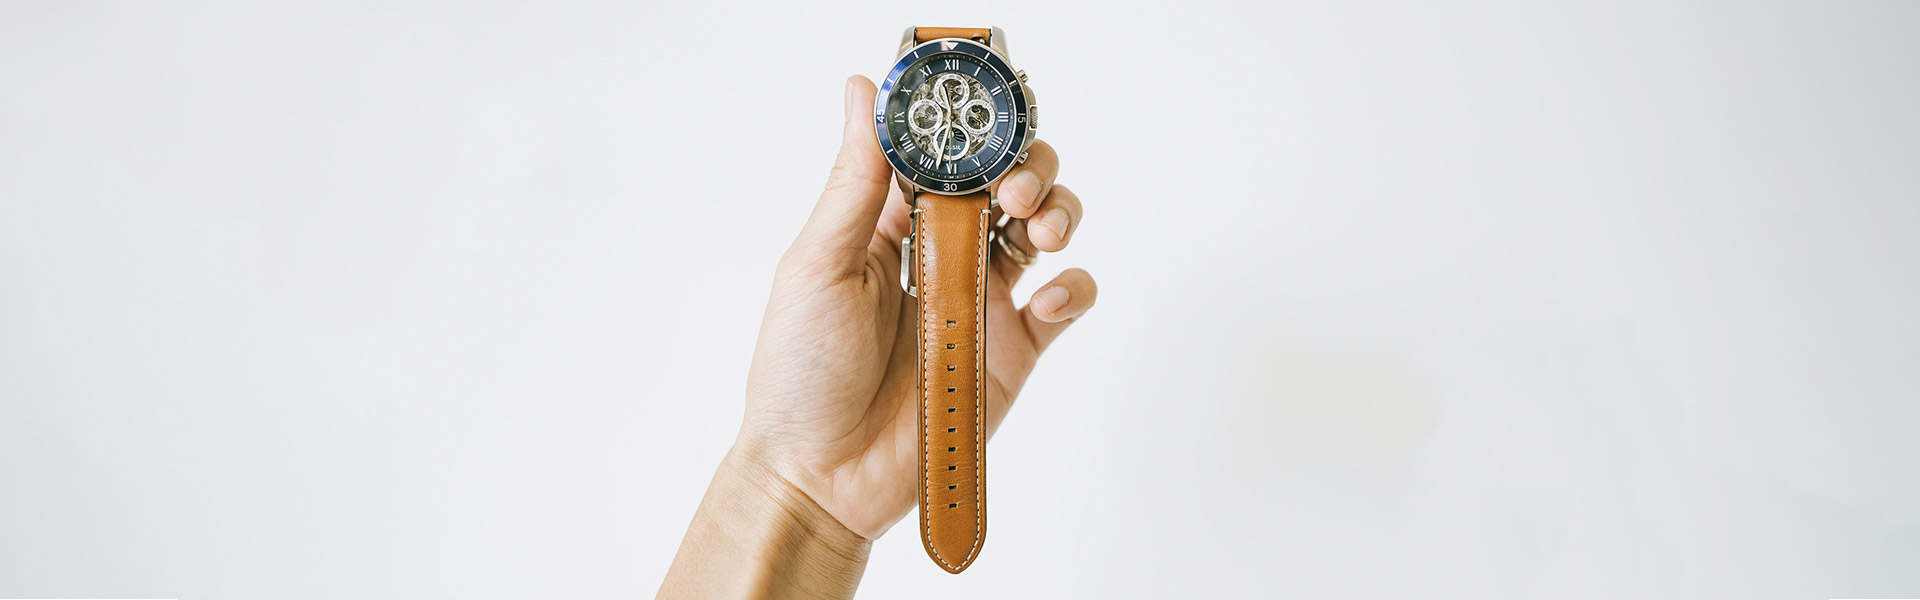 Cómo limpiar tu reloj de la forma correcta